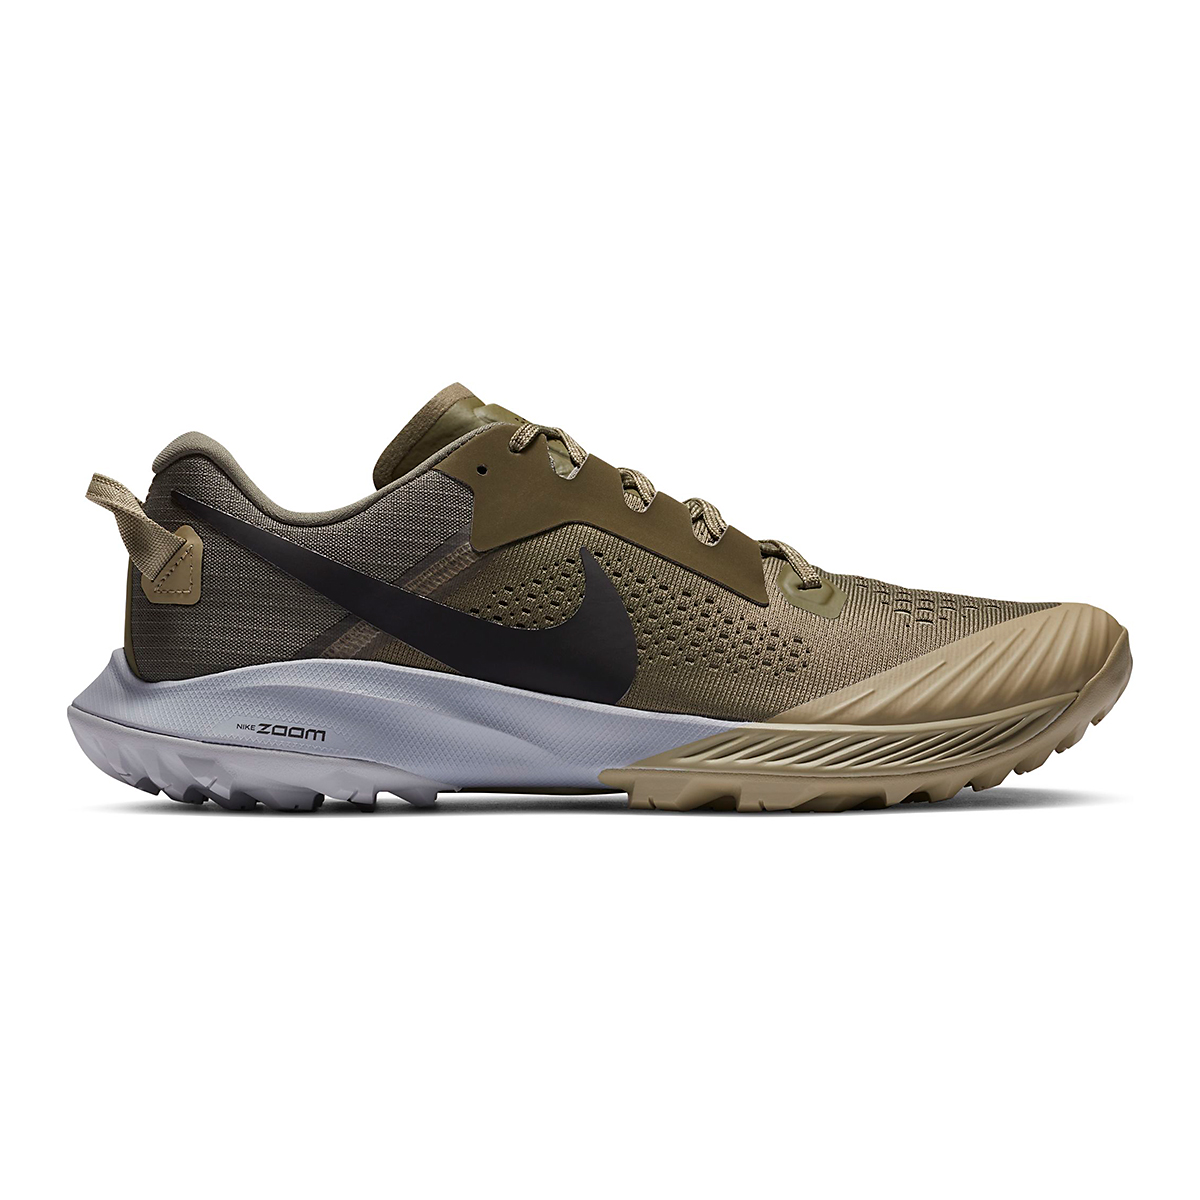 Men's Nike Air Zoom Terra Kiger 6 Trail Running Shoe - Color: Medium Olive/Medium Khaki/Wolf Grey/Black - Size: 6 - Width: Regular, Medium Olive/Medium Khaki/Wolf Grey/Black, large, image 1